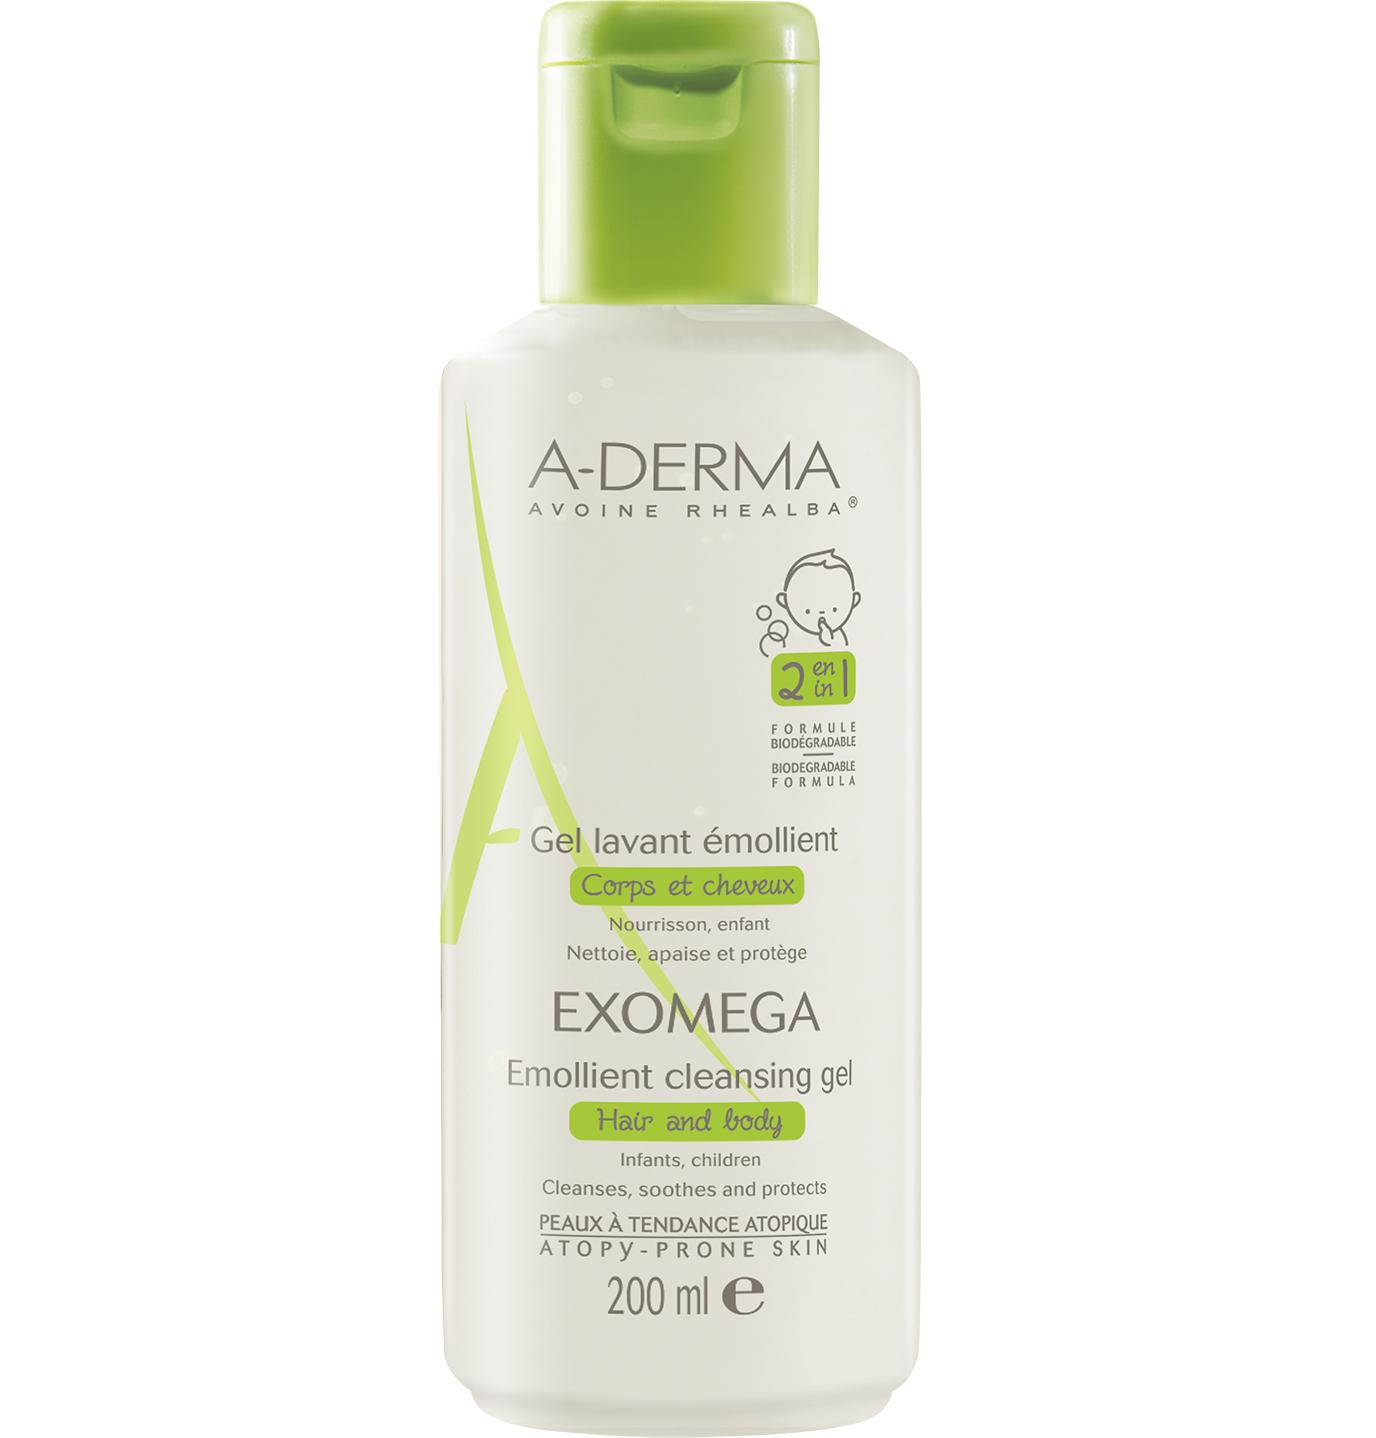 A-Derma Exomega Gel Lavant Emollient 2 in 1 Μαλακτικό GelΚαθαρισμού & Ενυδάτωσης για το Ατοπικό Δέρμα, Μαλλιά & Σώμα 200ml